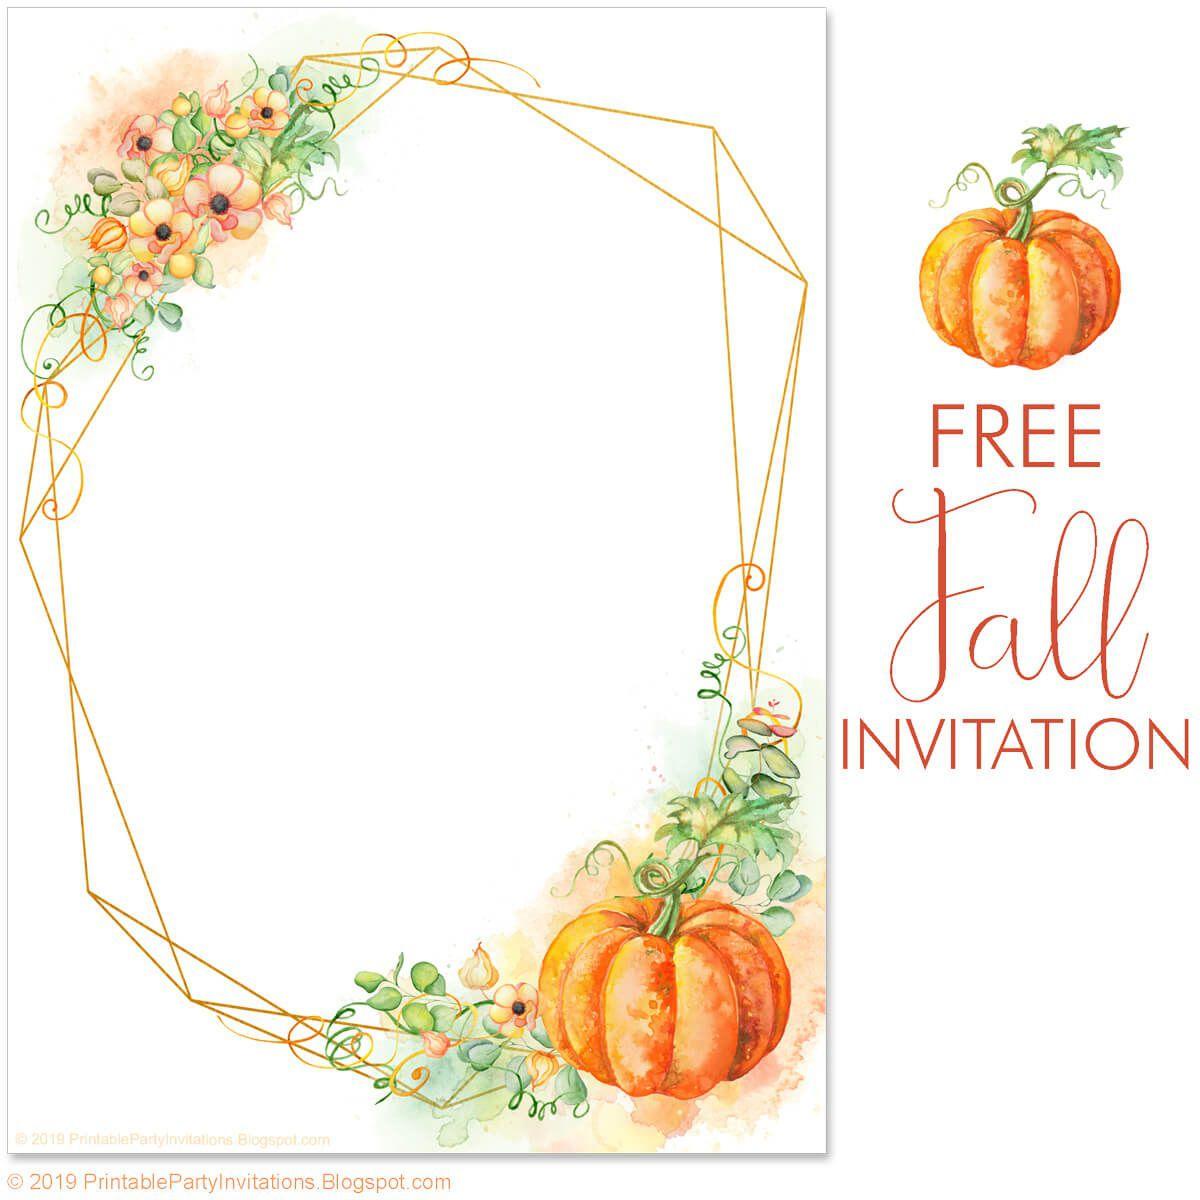 002 Fantastic Free Fall Invitation Template Printable Idea  Wedding For Mac Sunflower BurgundyFull